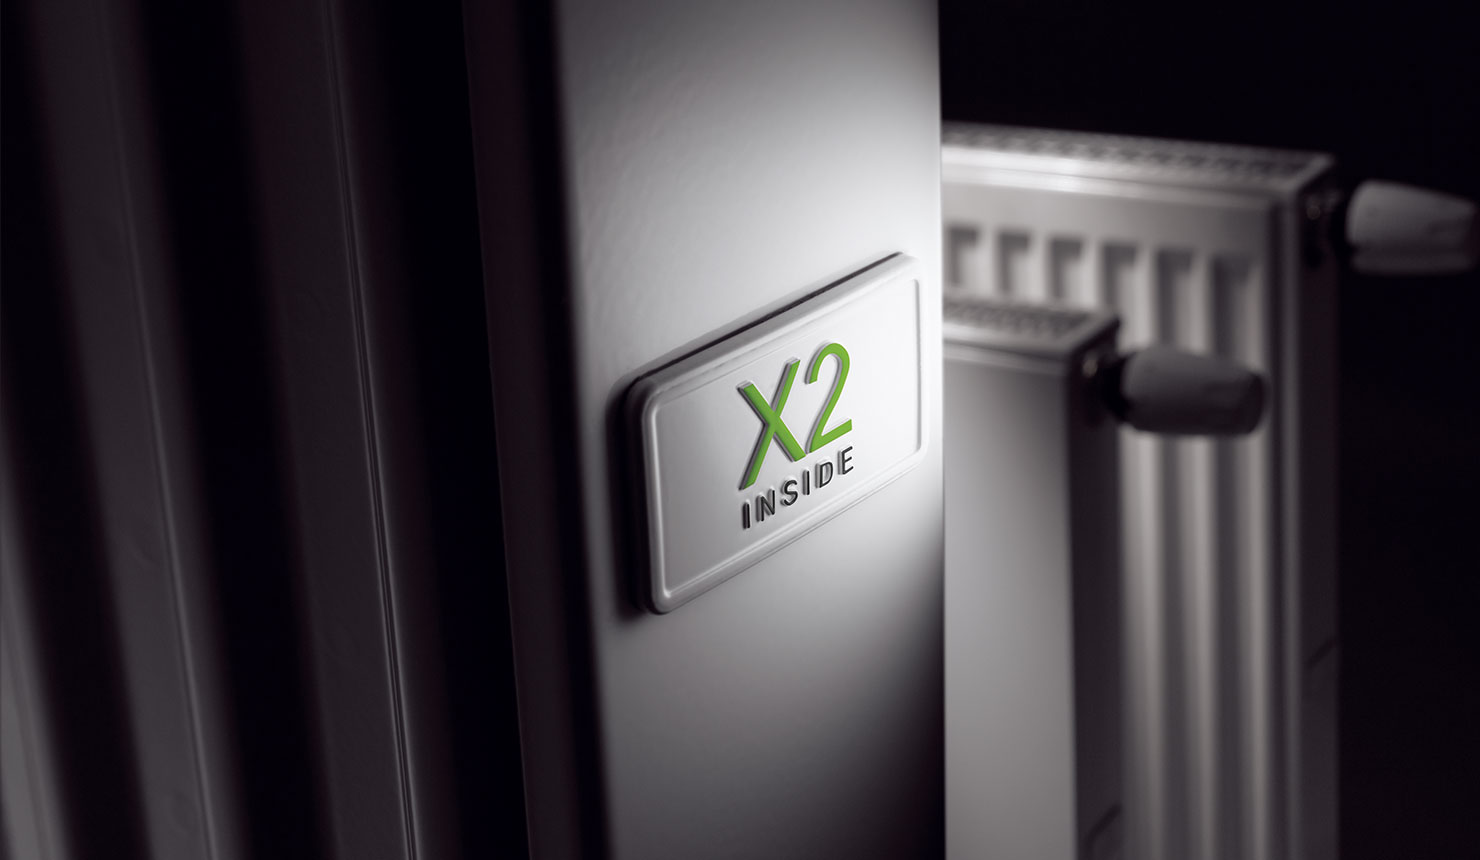 Full Size of Warum Therm X2 Energiesparheizkrper Kermi Wohnzimmer Kermi Flachheizkörper